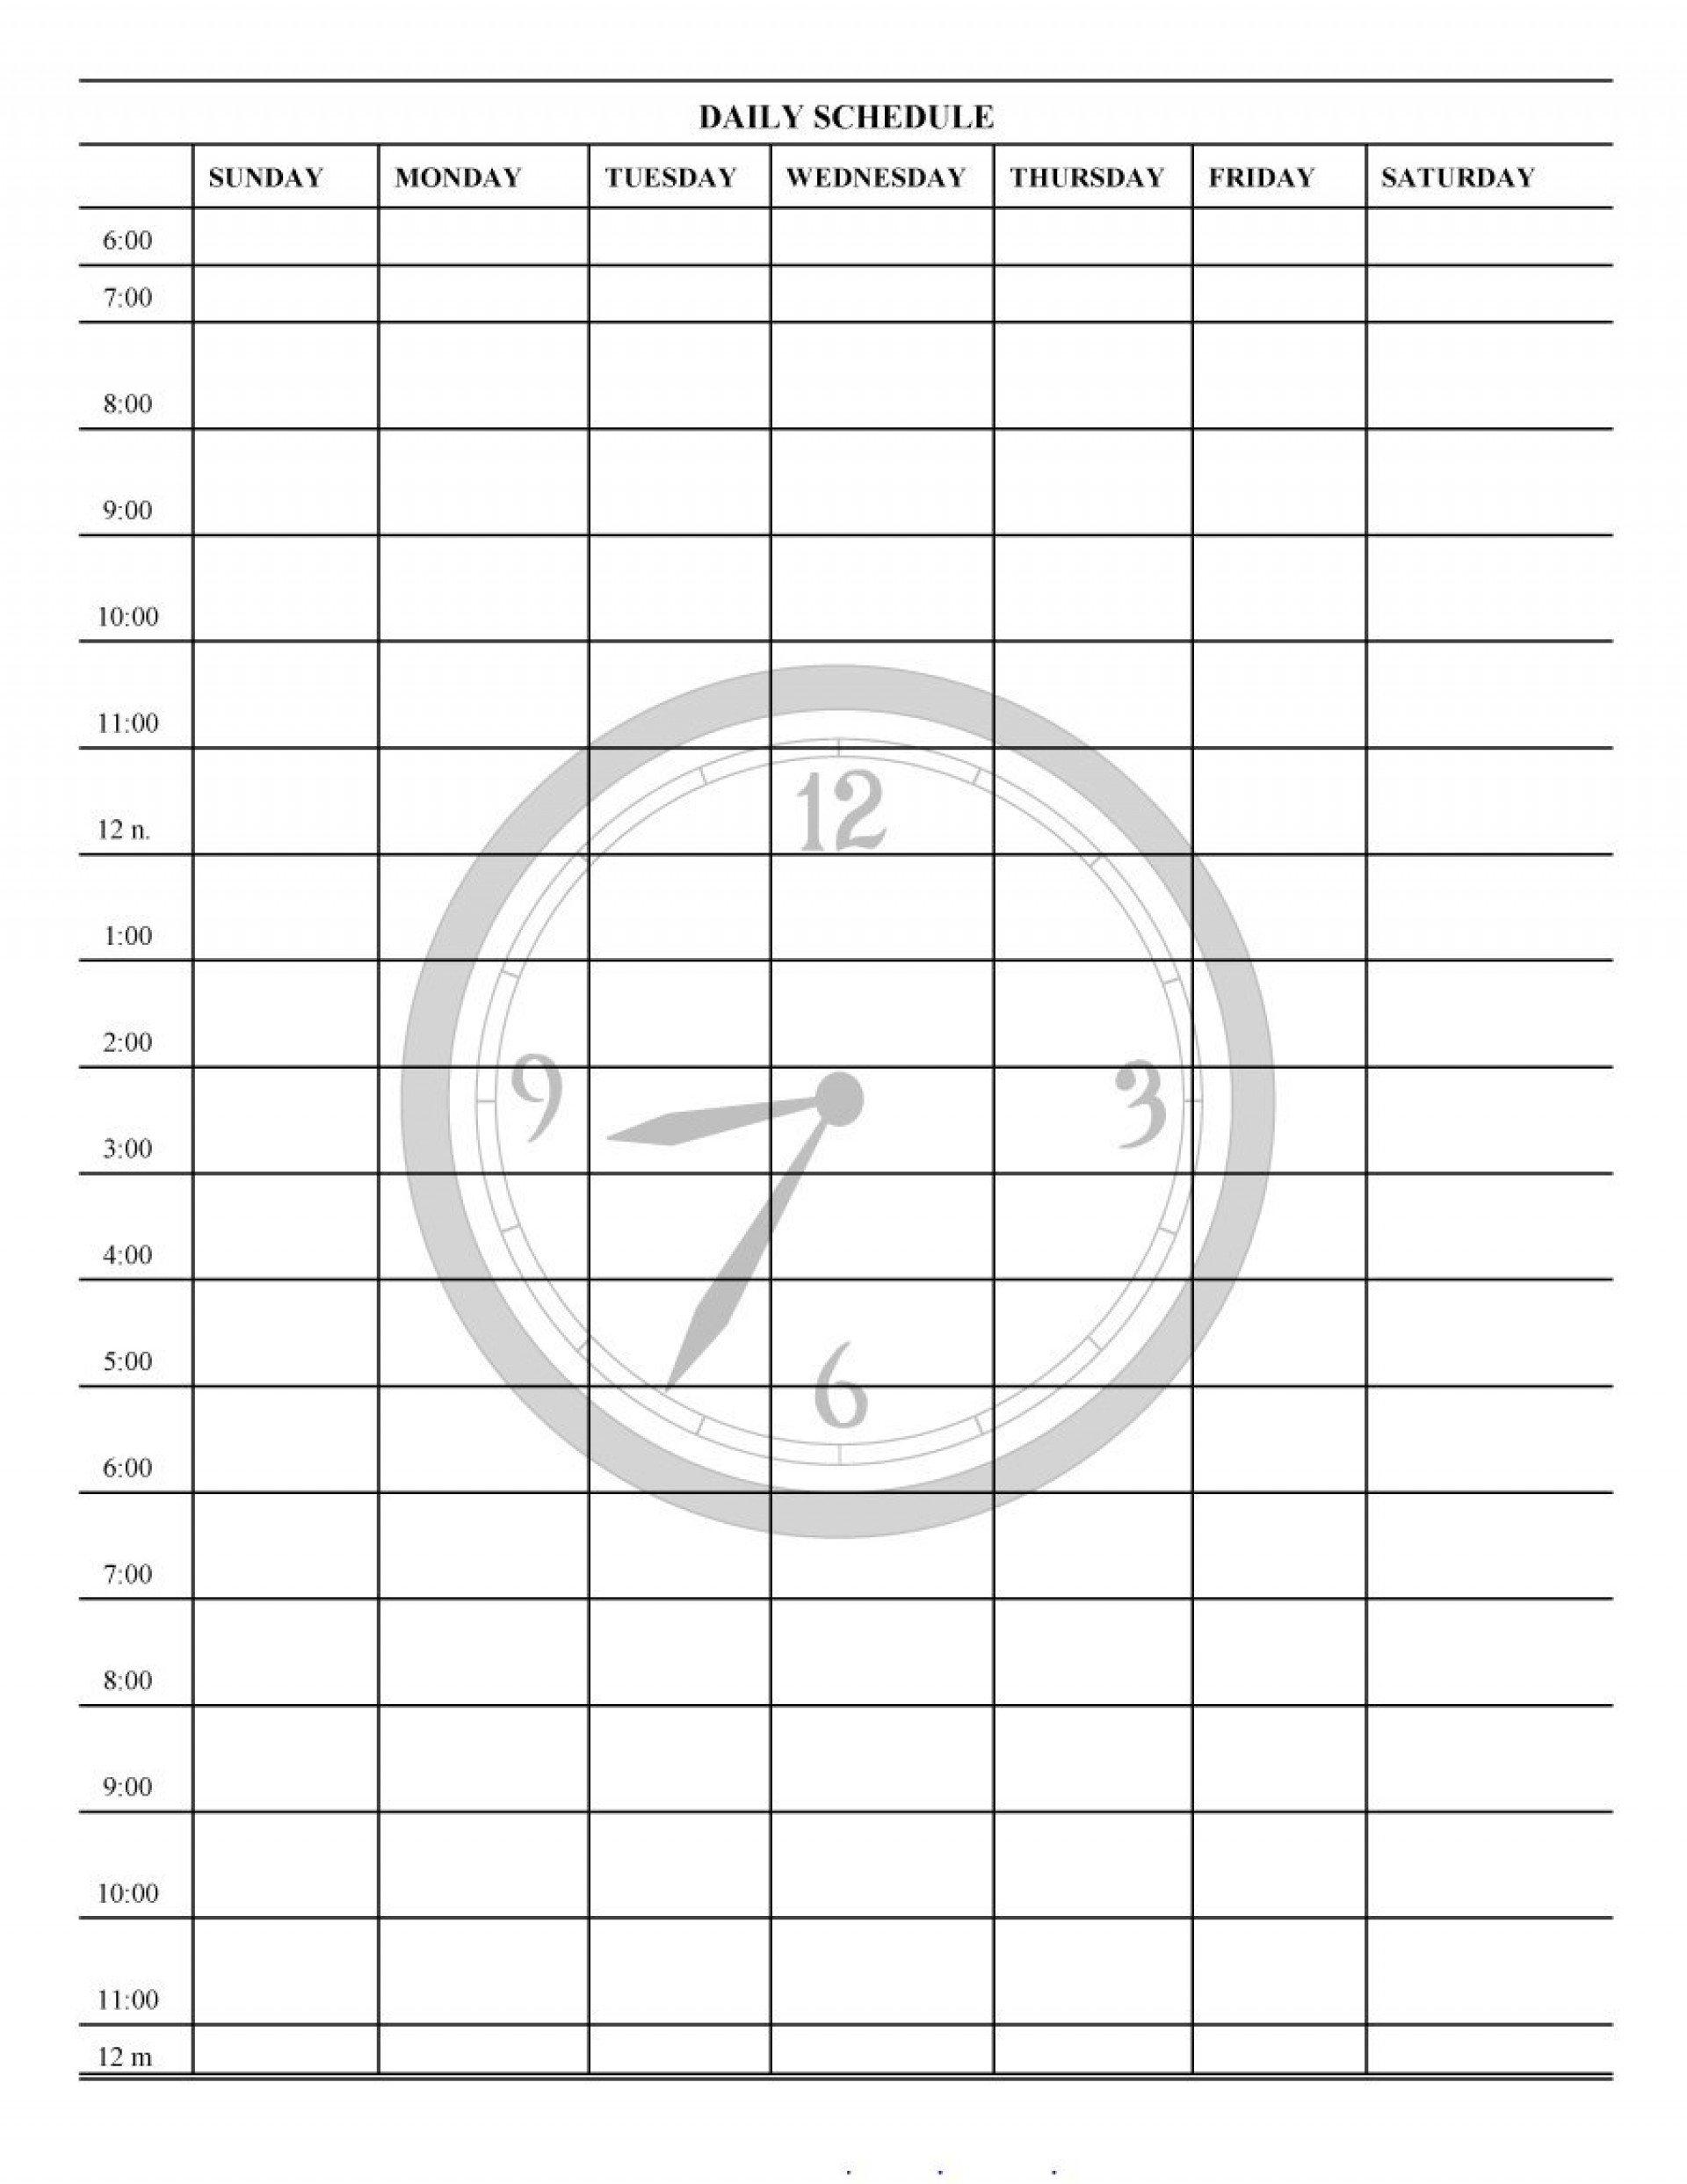 Free 24 Hour Daily Calendar Template | Daily Calendar Daily Calendar With Hour